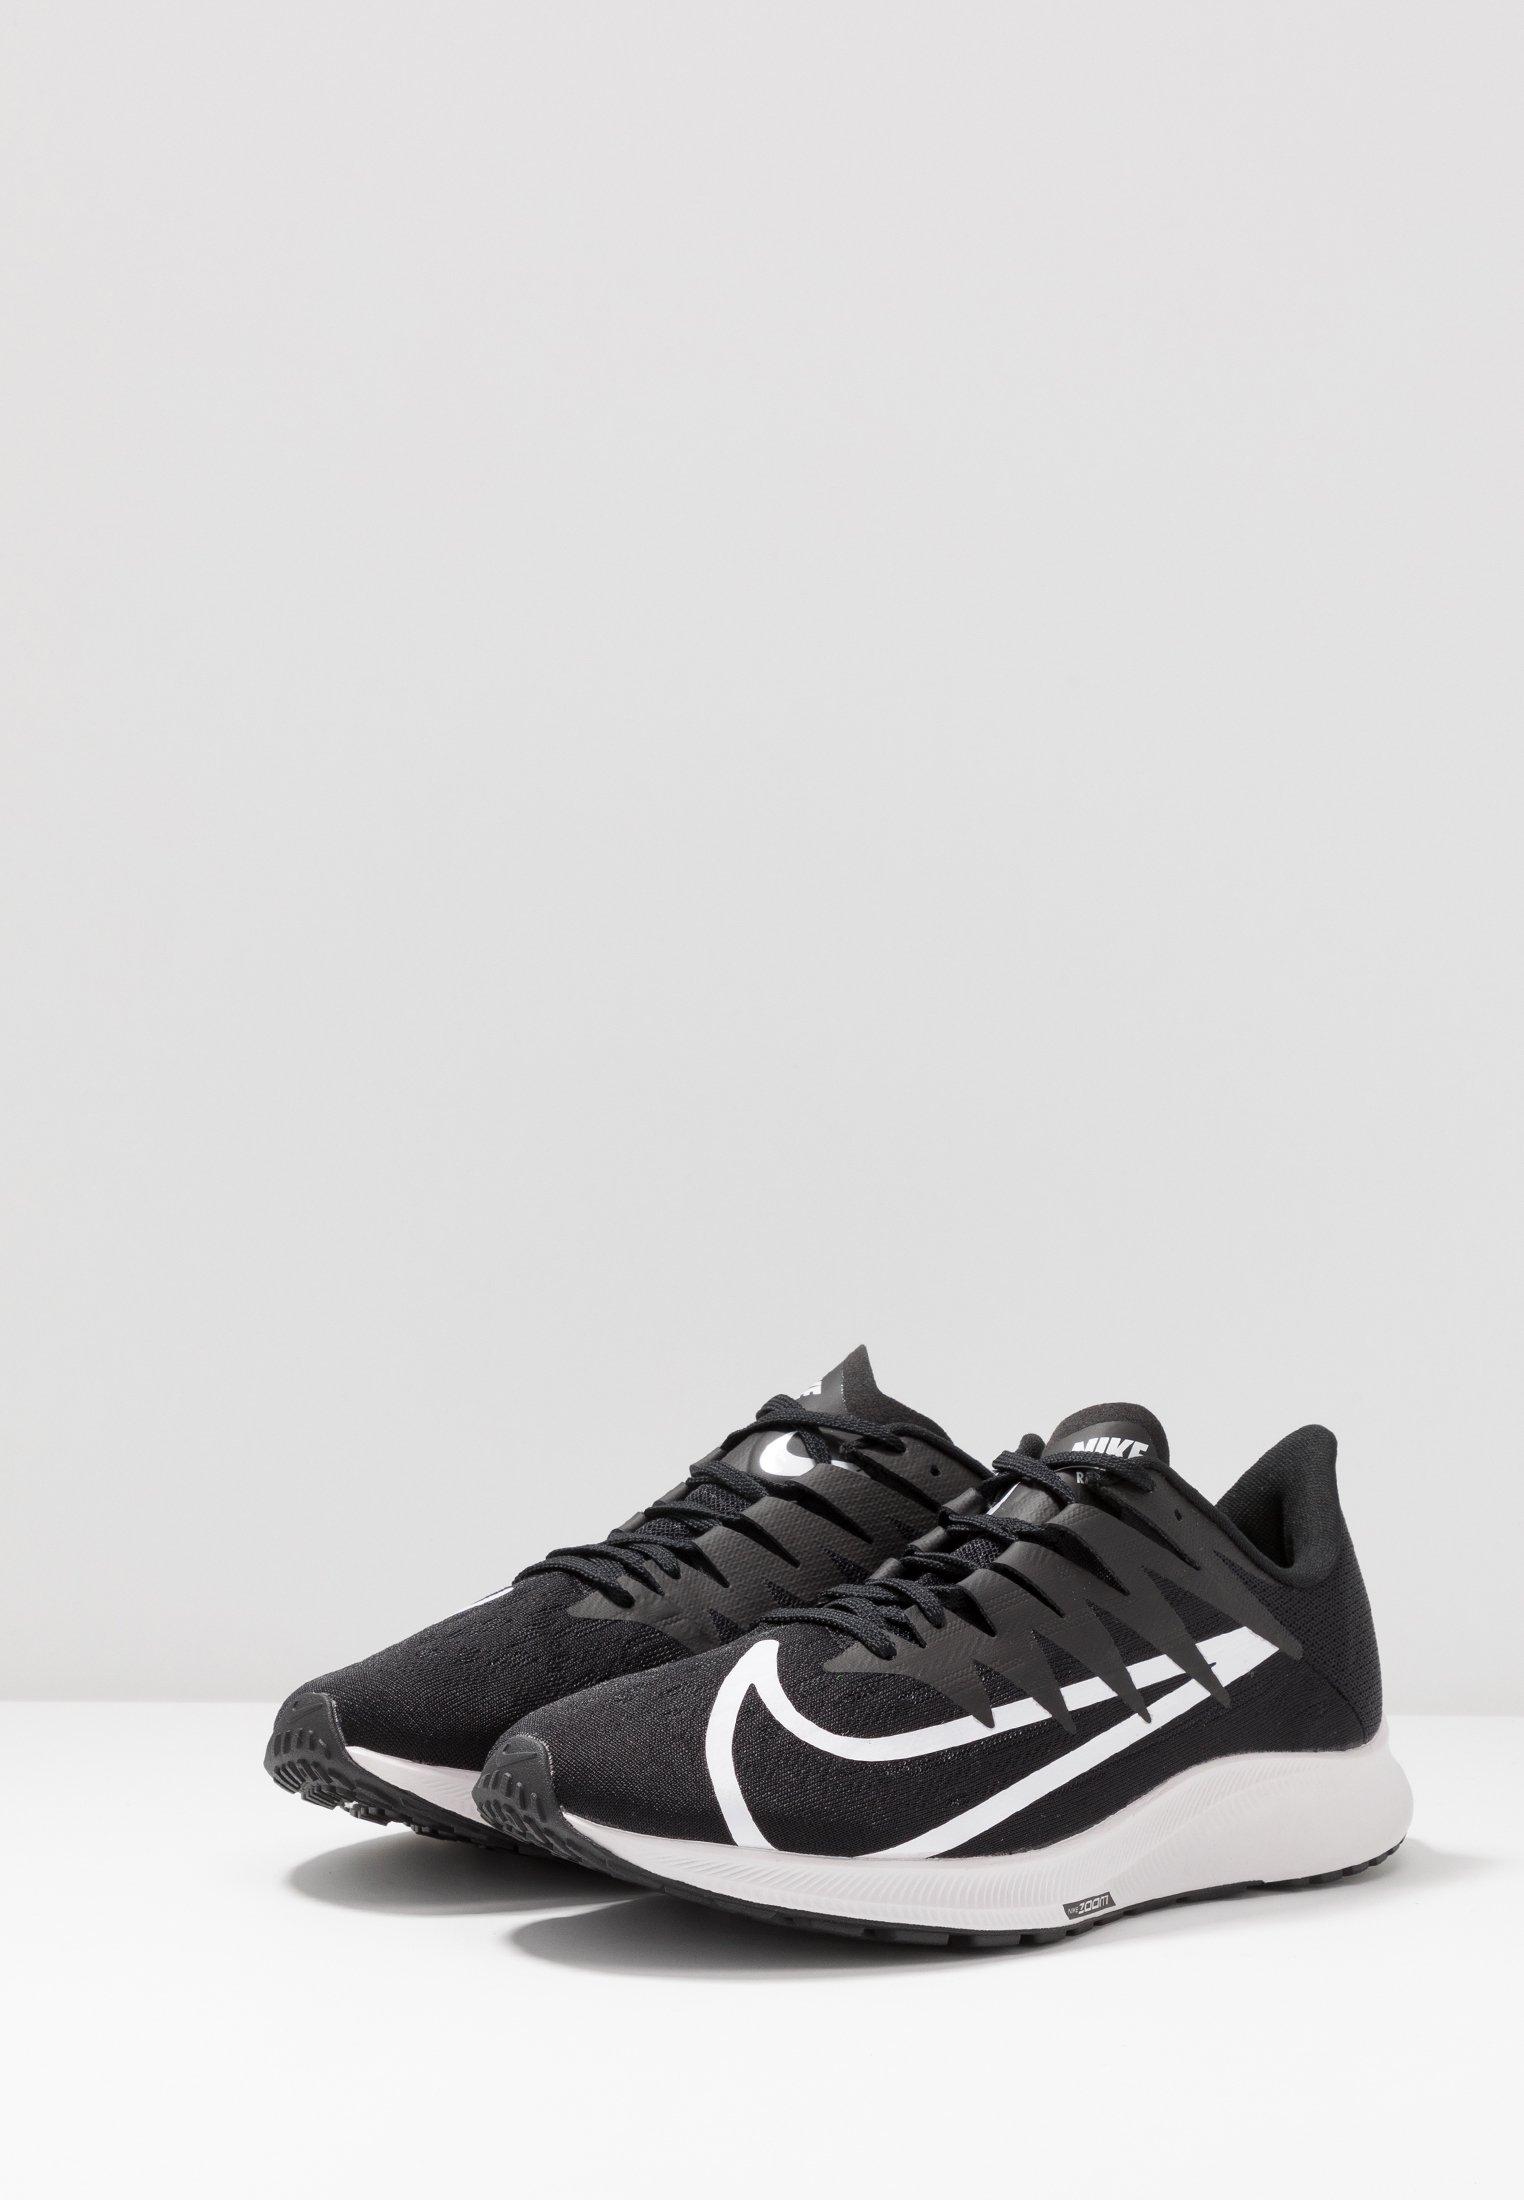 Grey De white Nike FlyChaussures vast Zoom Running Black Performance Neutres Rival rdCBexo